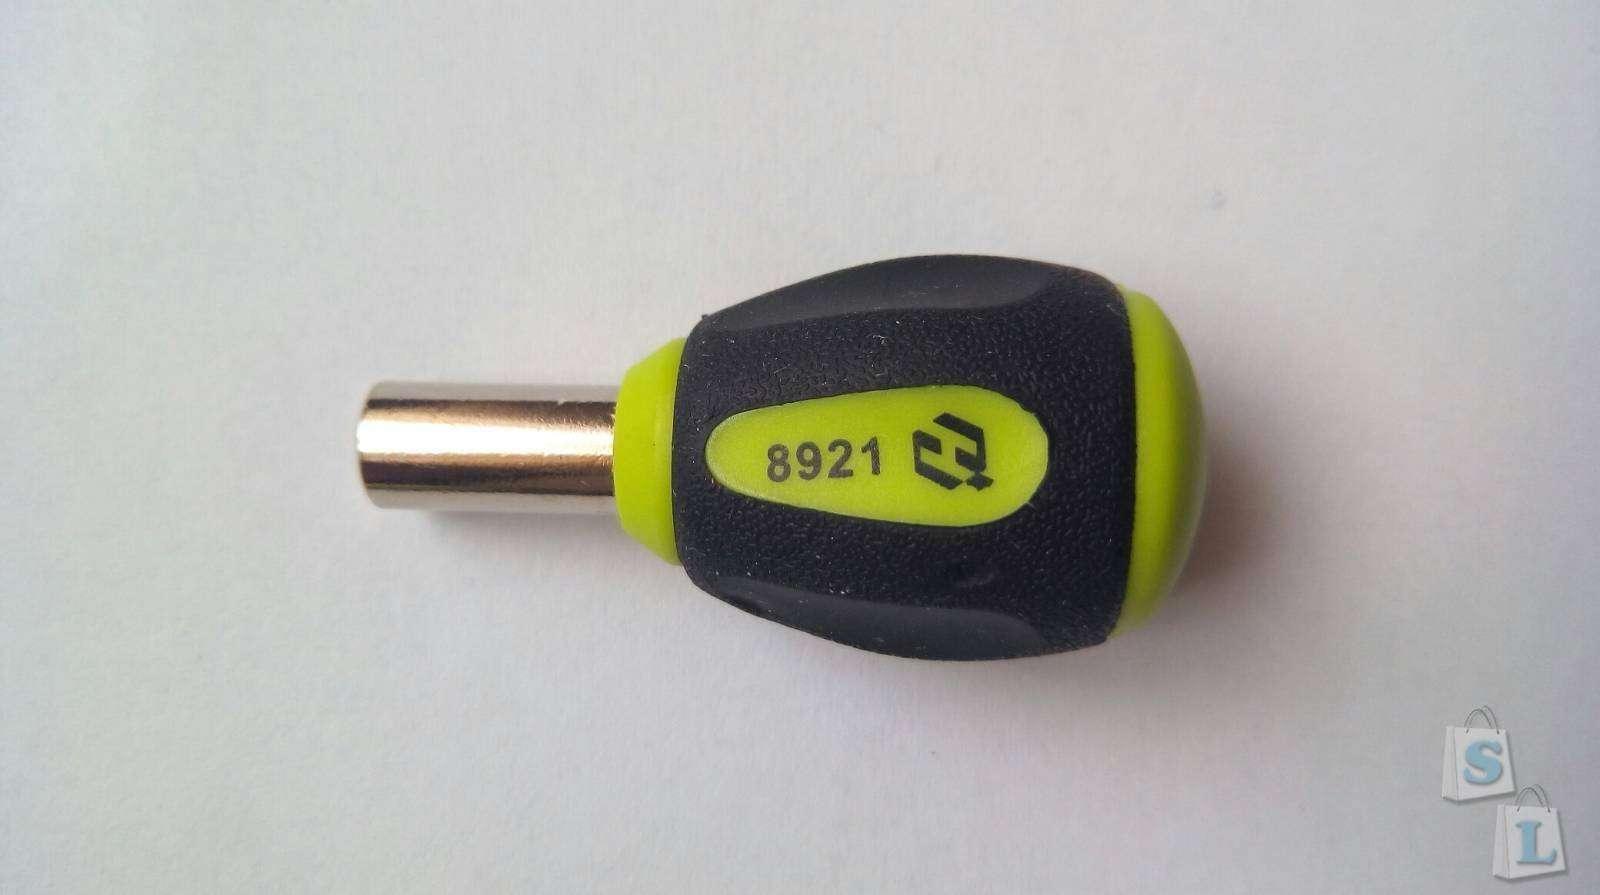 Banggood: HUIJIAQI No.8921 53 in 1. Набор бит для ремонта техники.